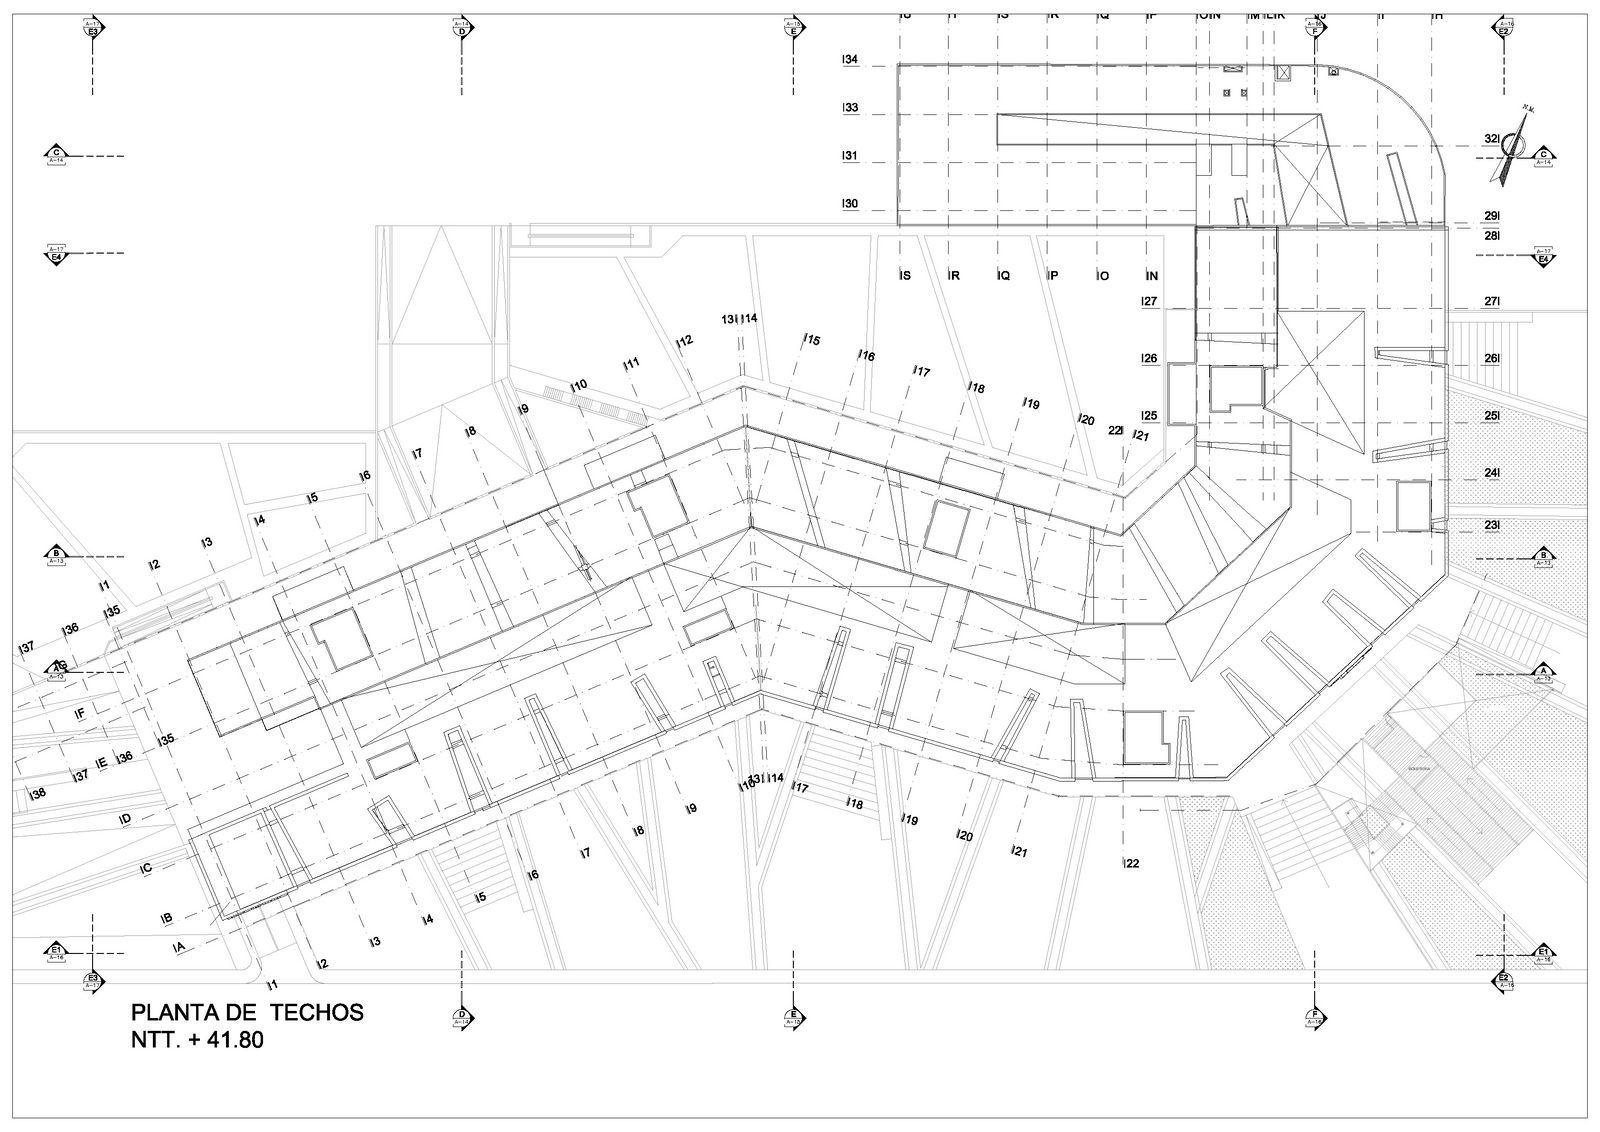 Revista de arquitectura y dise o peruarki rafael rios for Ejes arquitectonicos